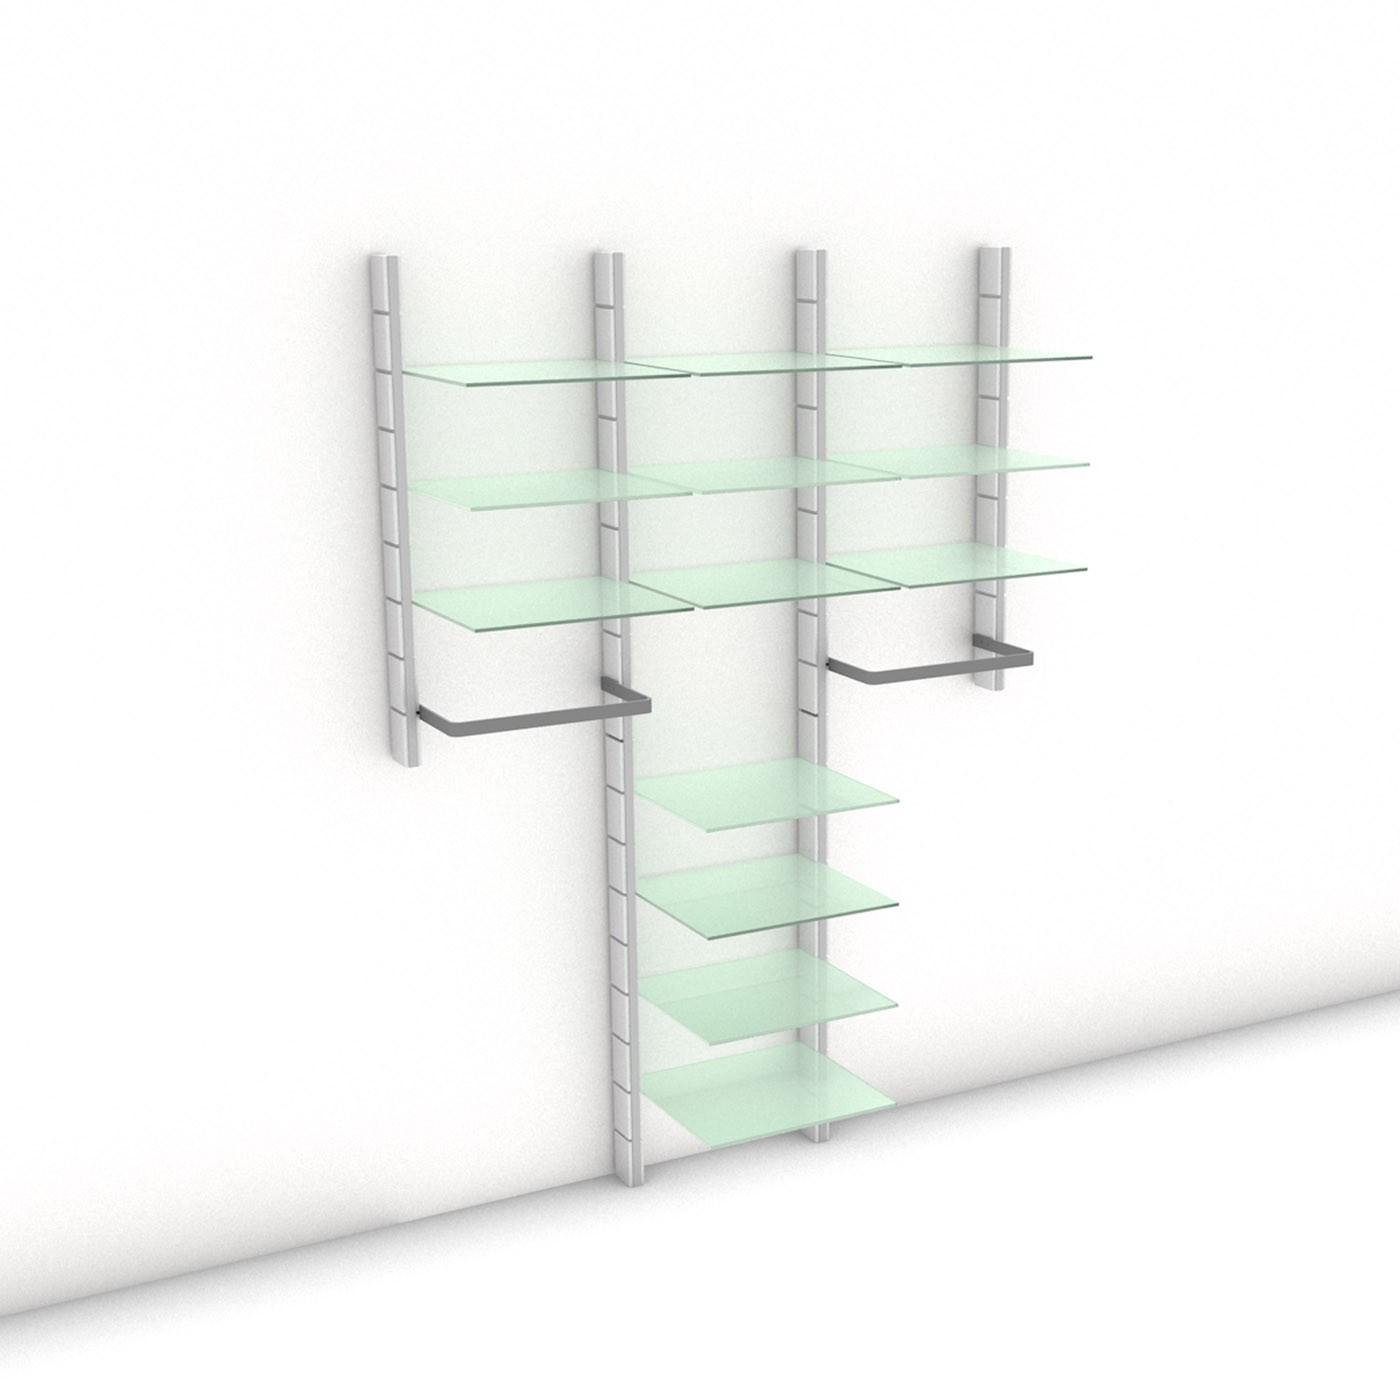 "Begehbarer Kleiderschrank - WALK-IN ""Comfort I"" 154  - Maß: 154 x 215,2 x 45 cm (B x H x T)"